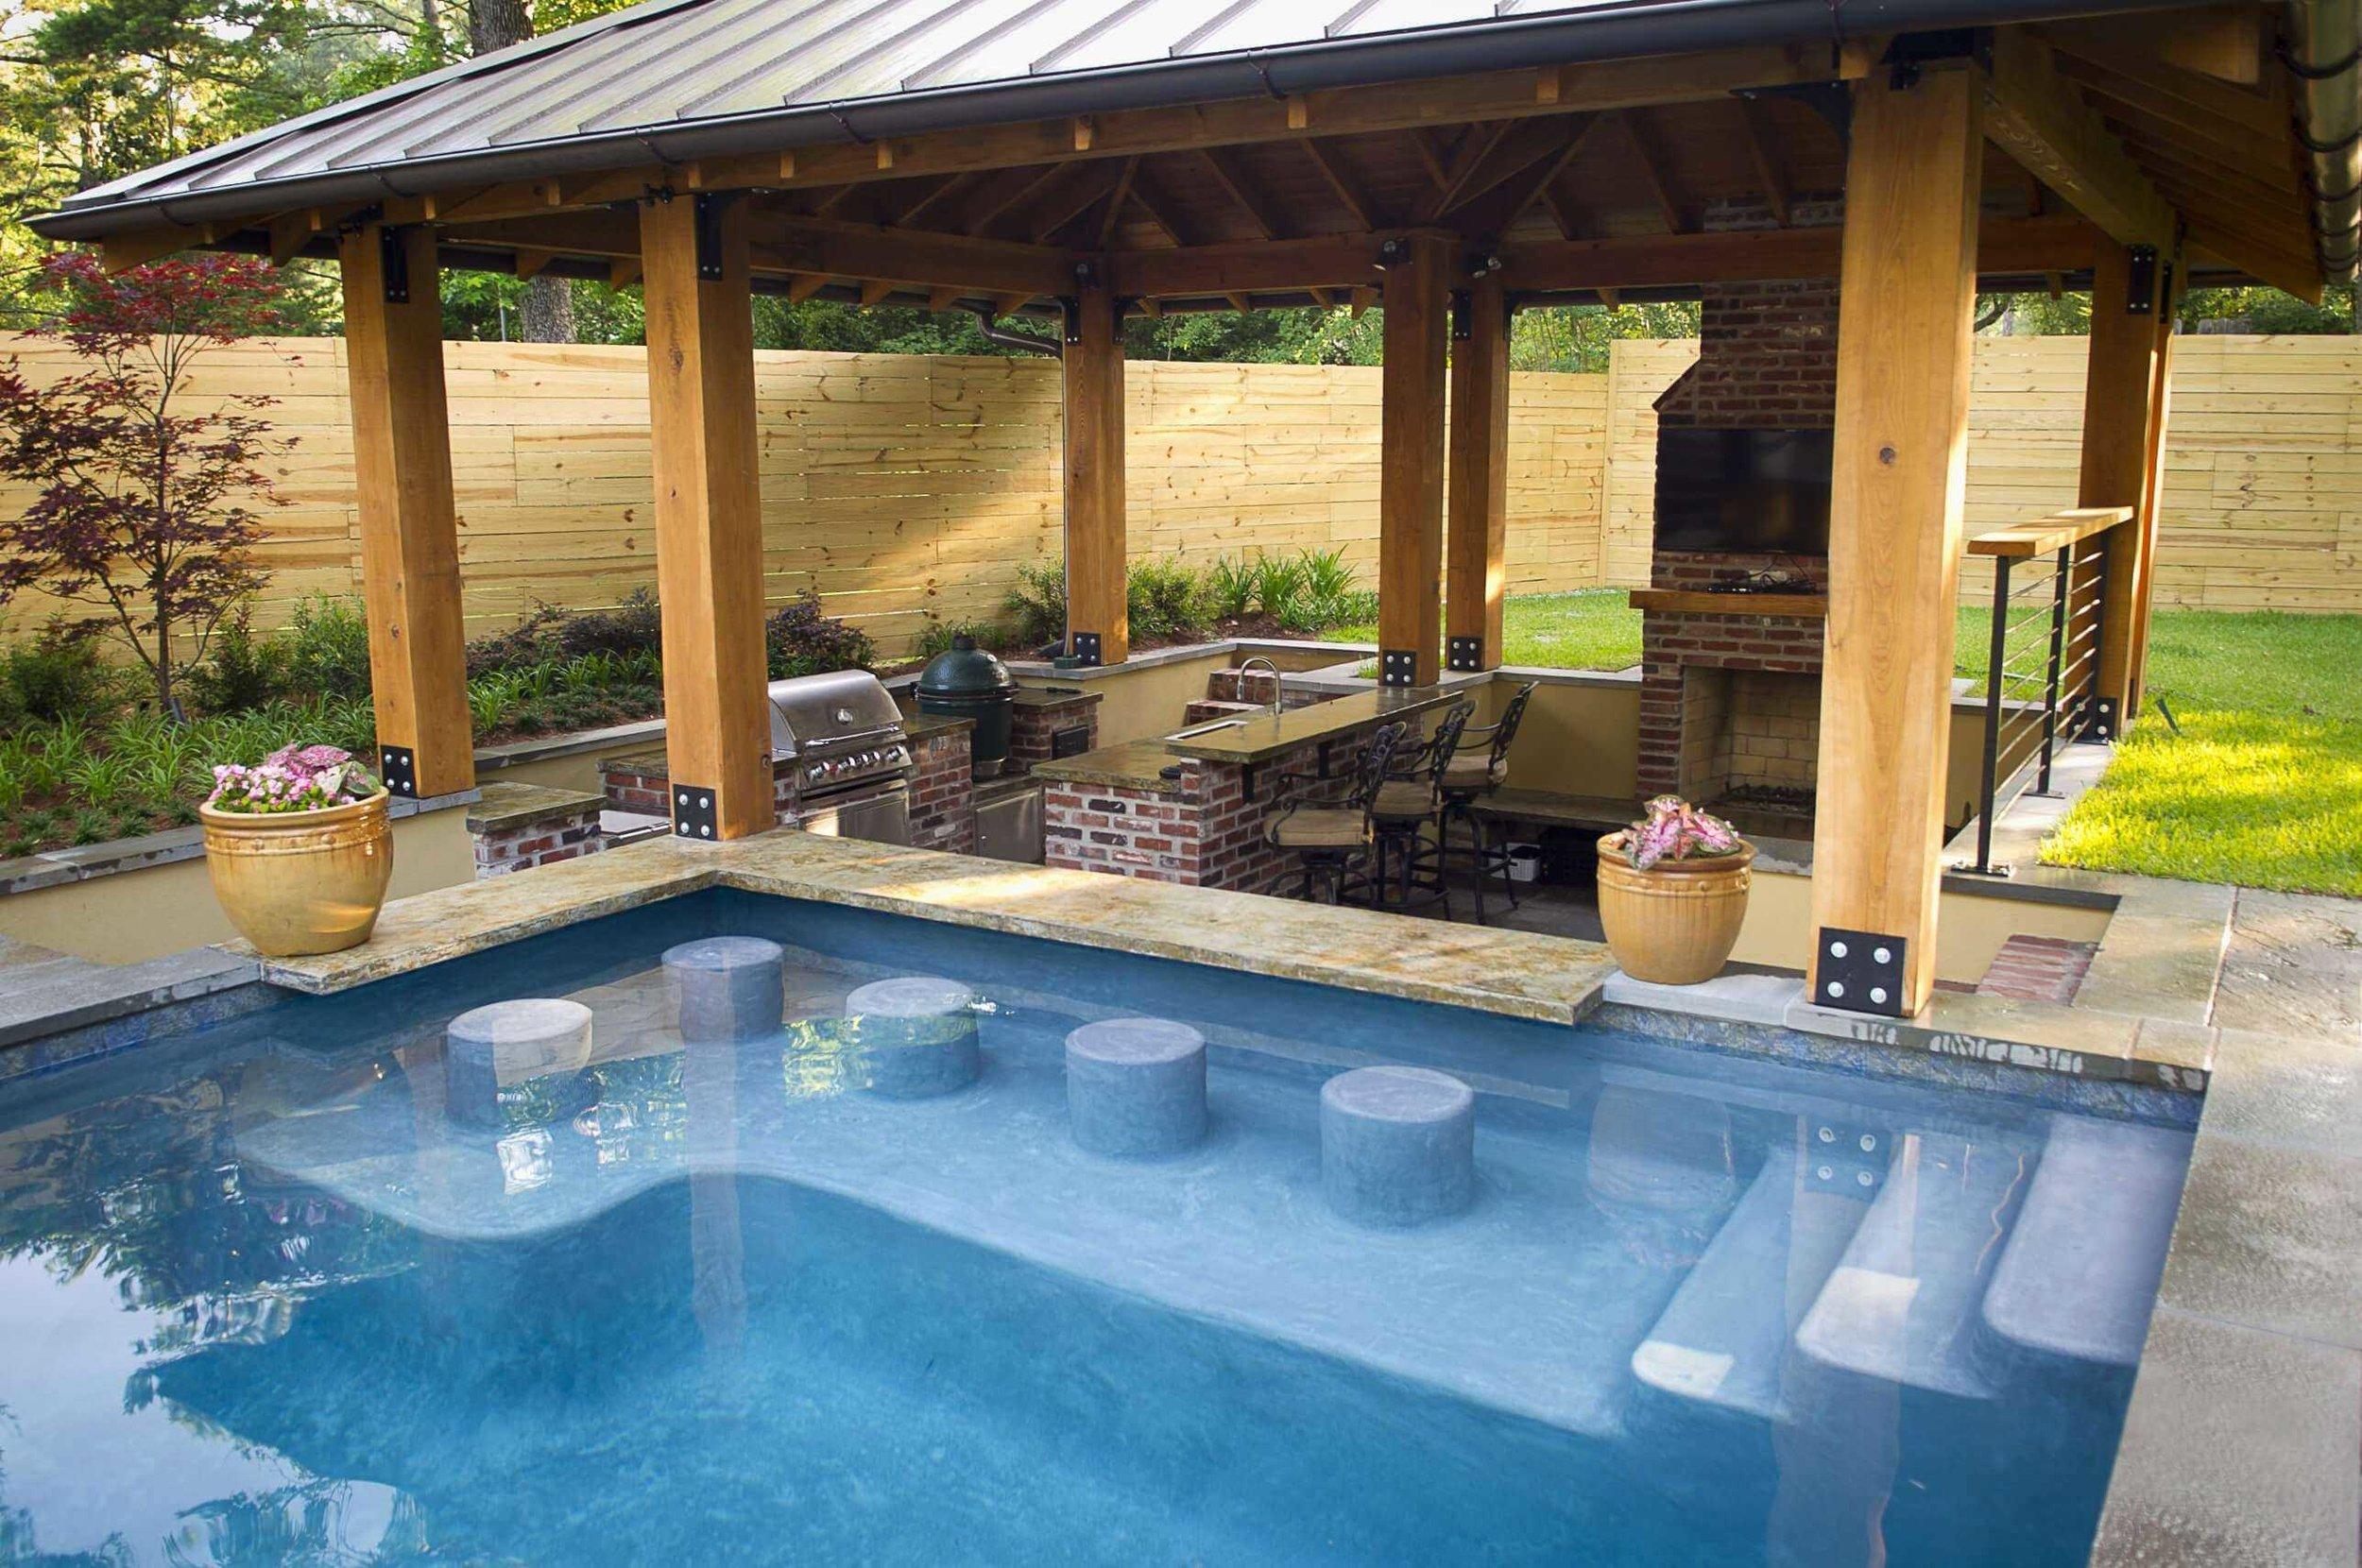 swimming-pool-bar-stools-inspirational-outdoor-living-spaces-ewing-aquatech-pools-of-swimming-pool-bar-stools.jpg